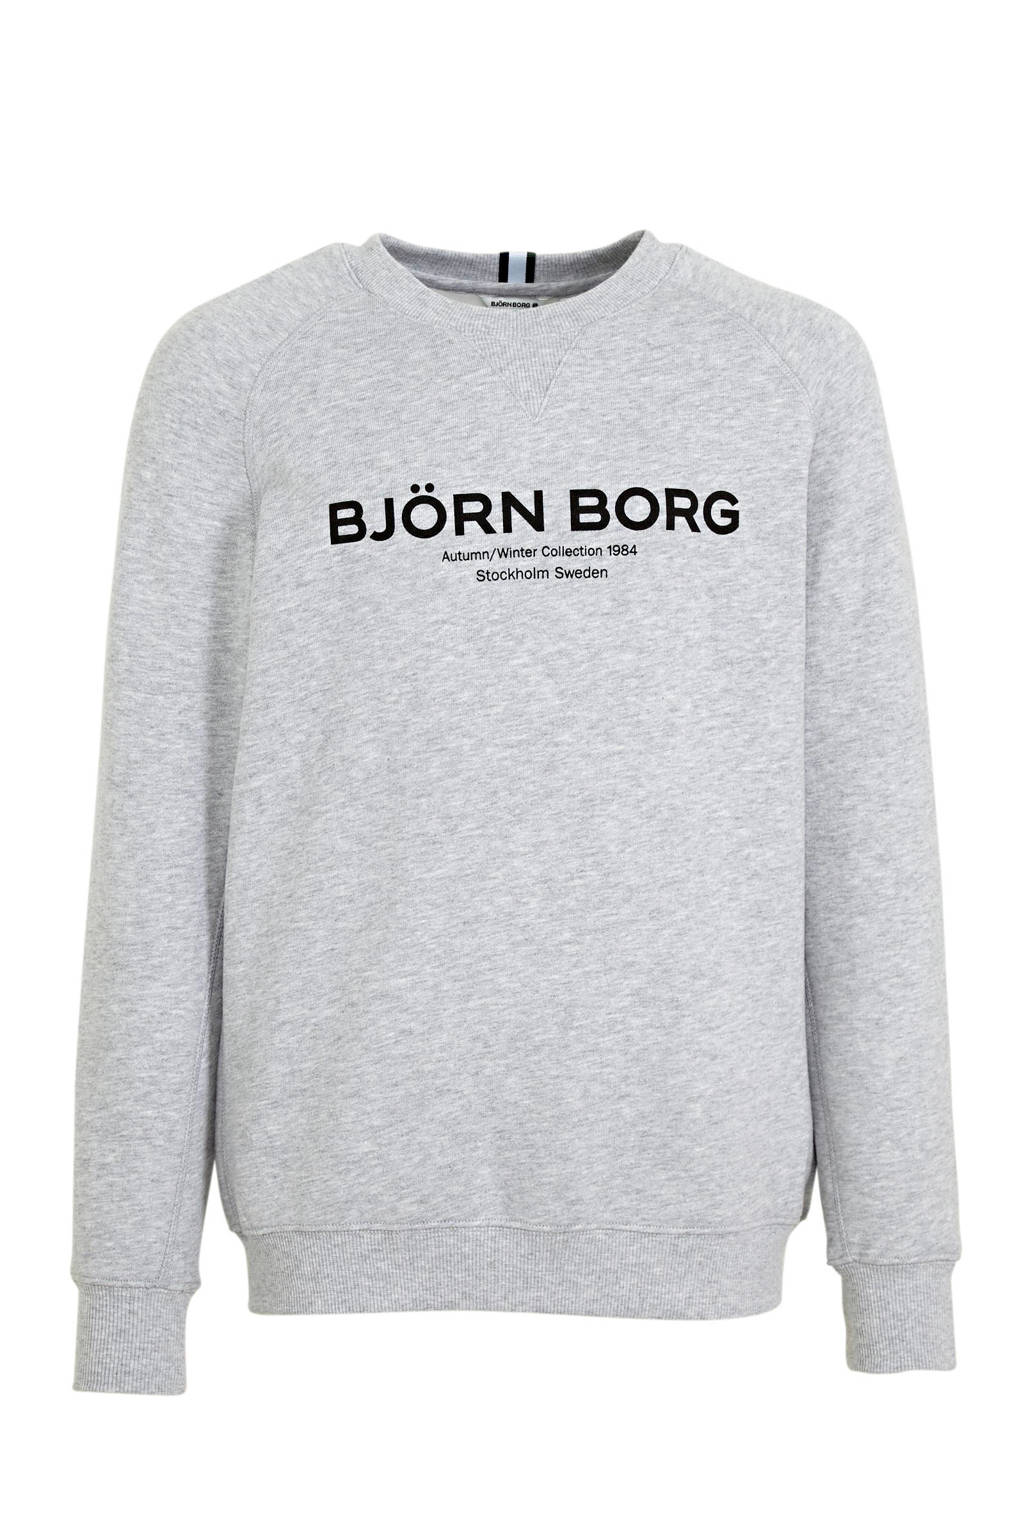 Björn Borg sweater met logo lichtgrijs melange, Lichtgrijs melange